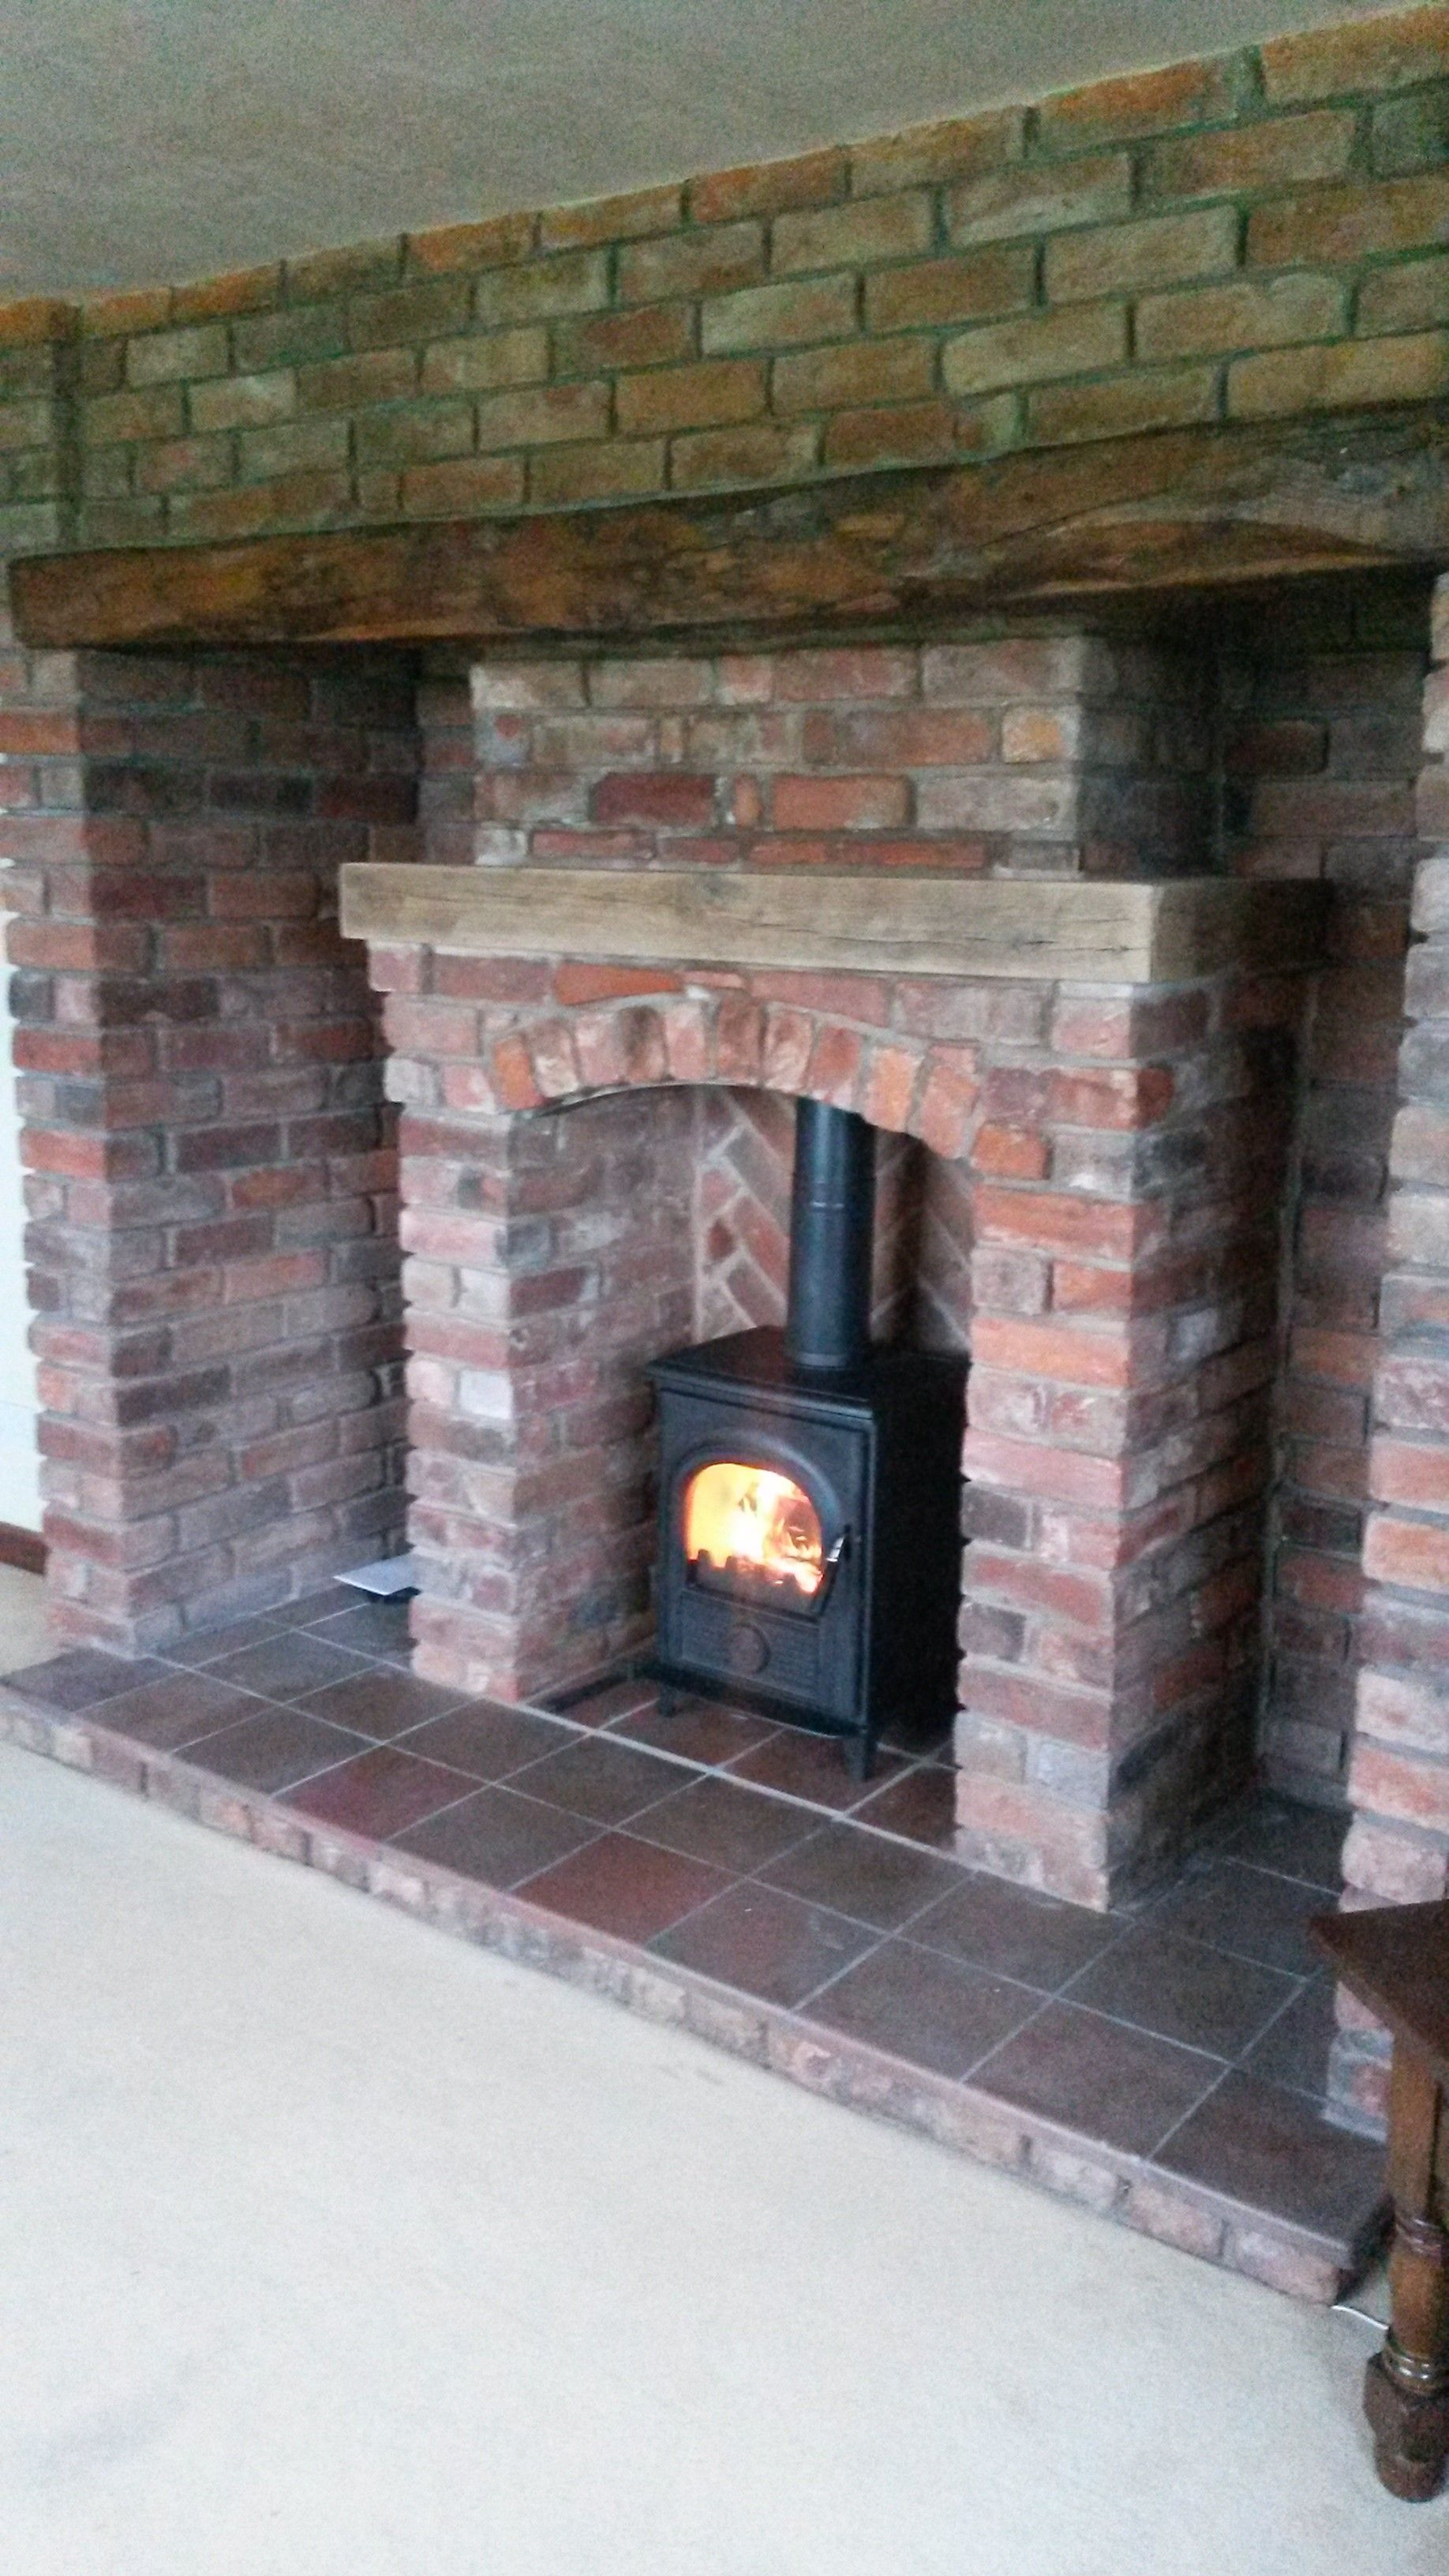 Alpha II Multi Fuel Stove and Brick Fireplace